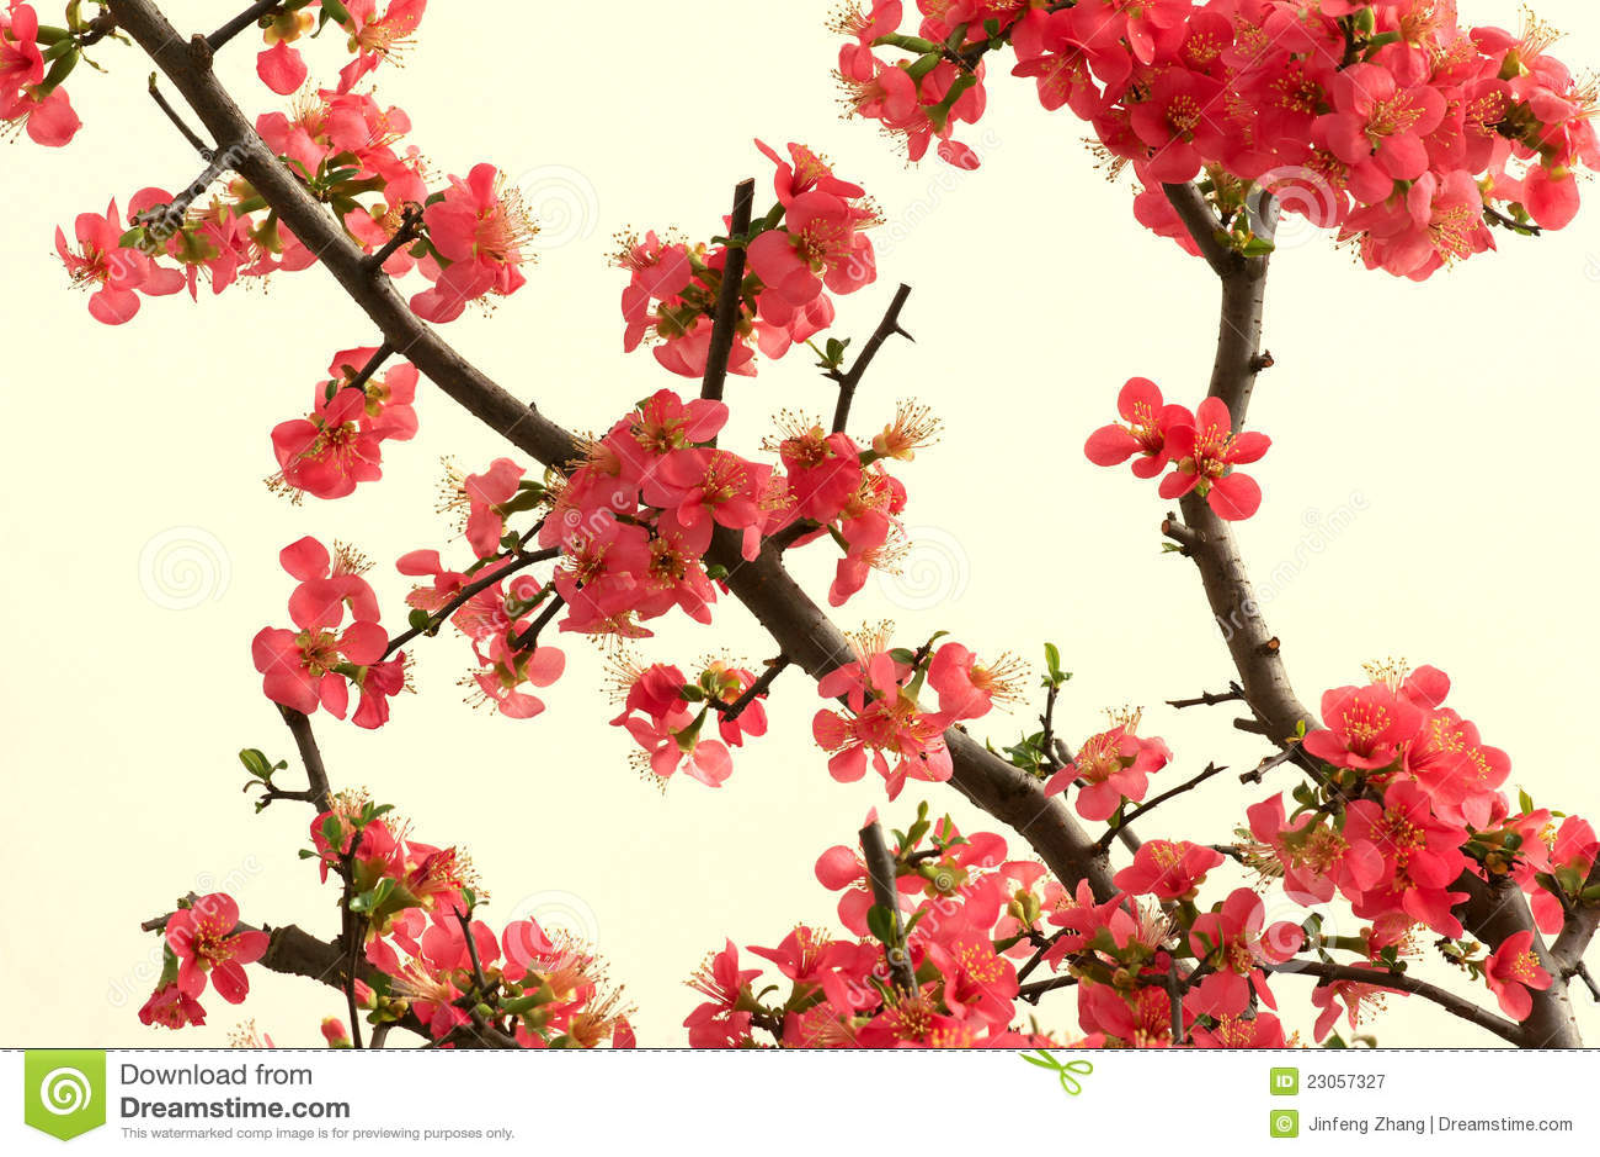 chinese flowers stock photo  image, Beautiful flower